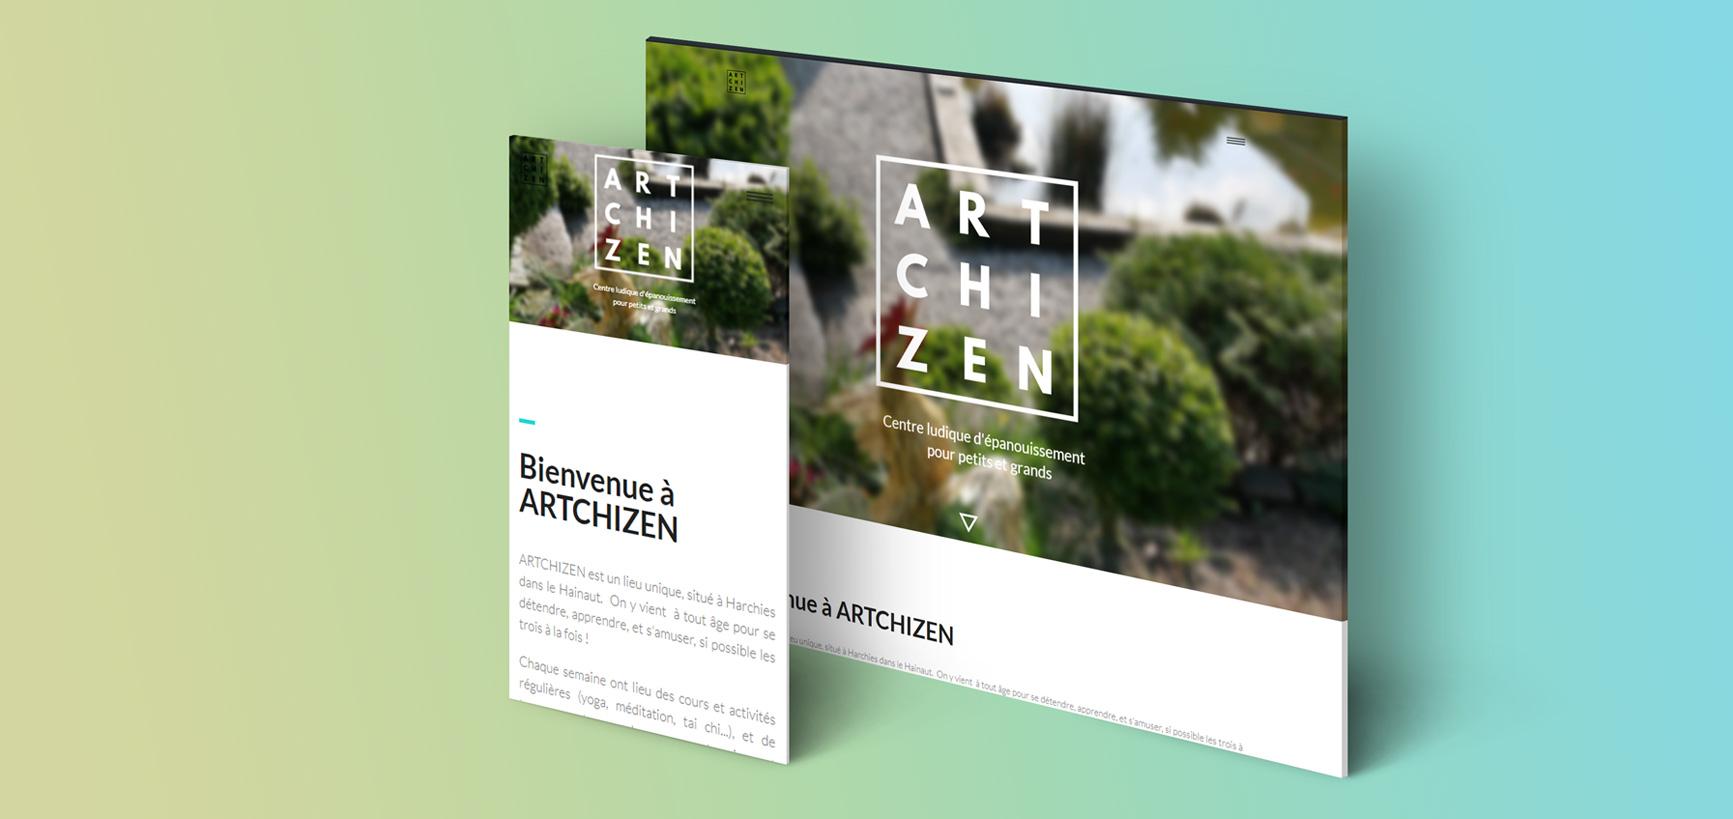 webdesign artchizen